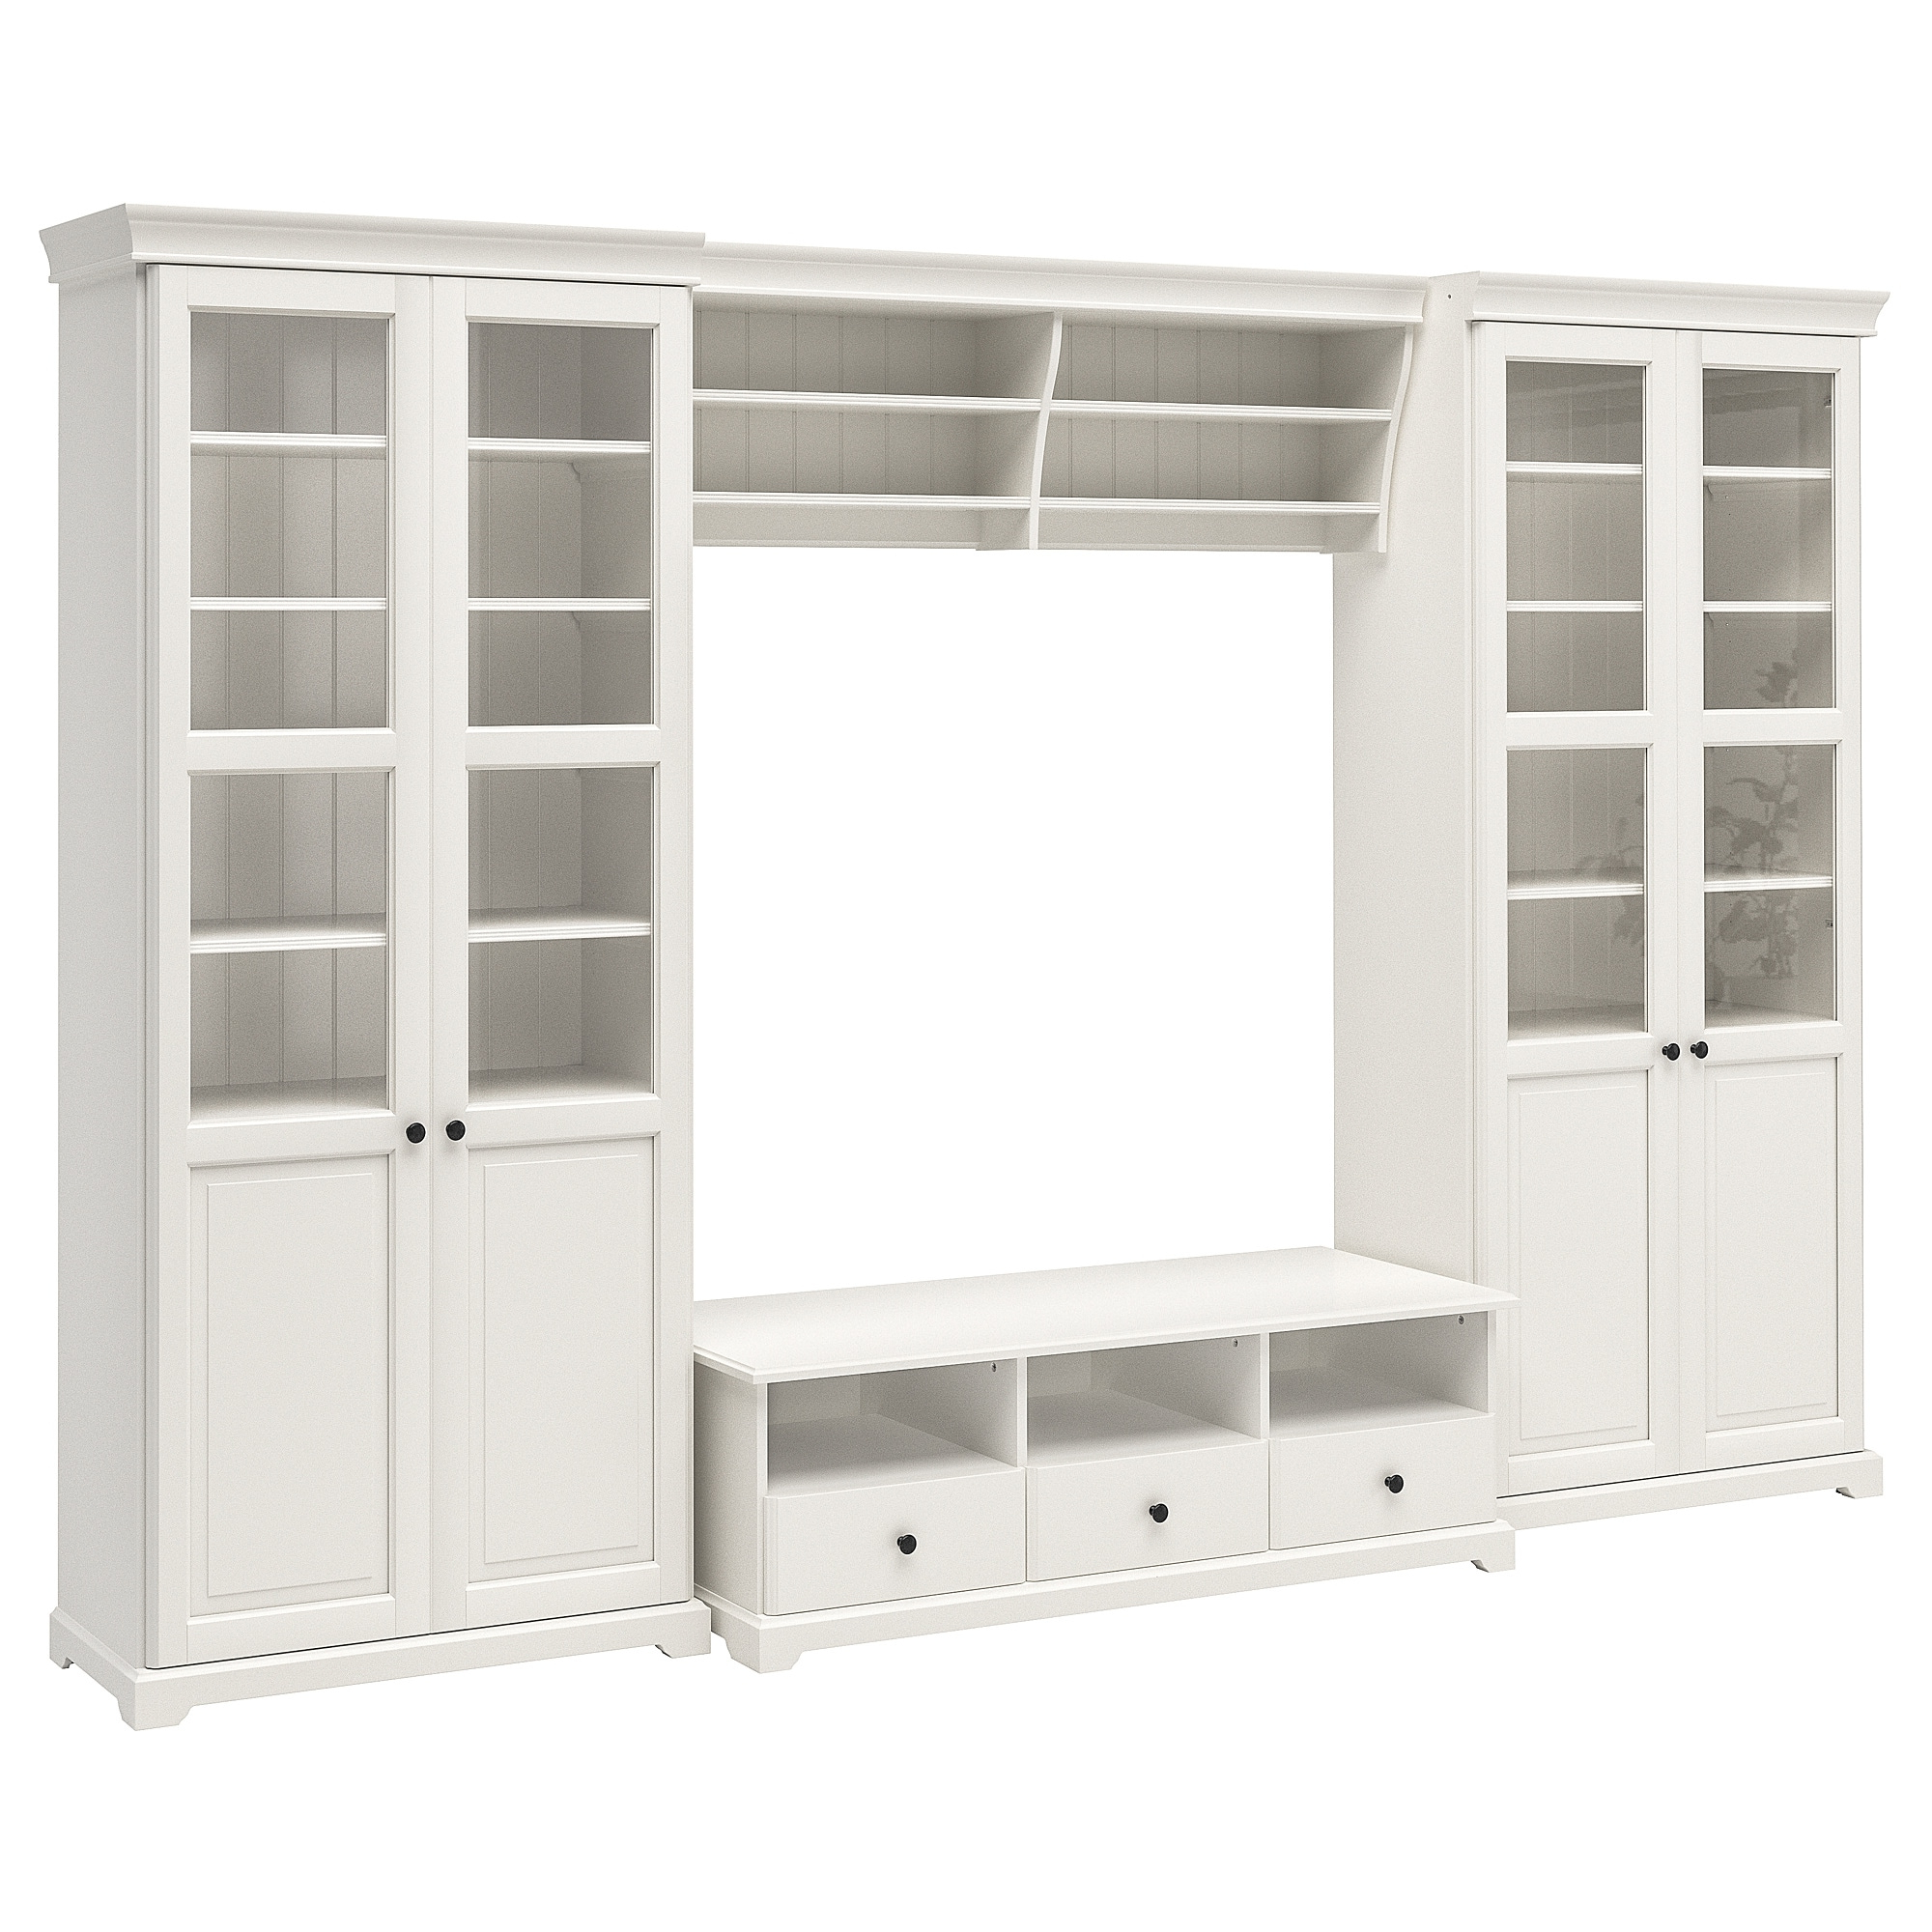 Muebles Almacenaje J7do Liatorp Mueble Tv Con Almacenaje Blanco 332 X 214 Cm Ikea